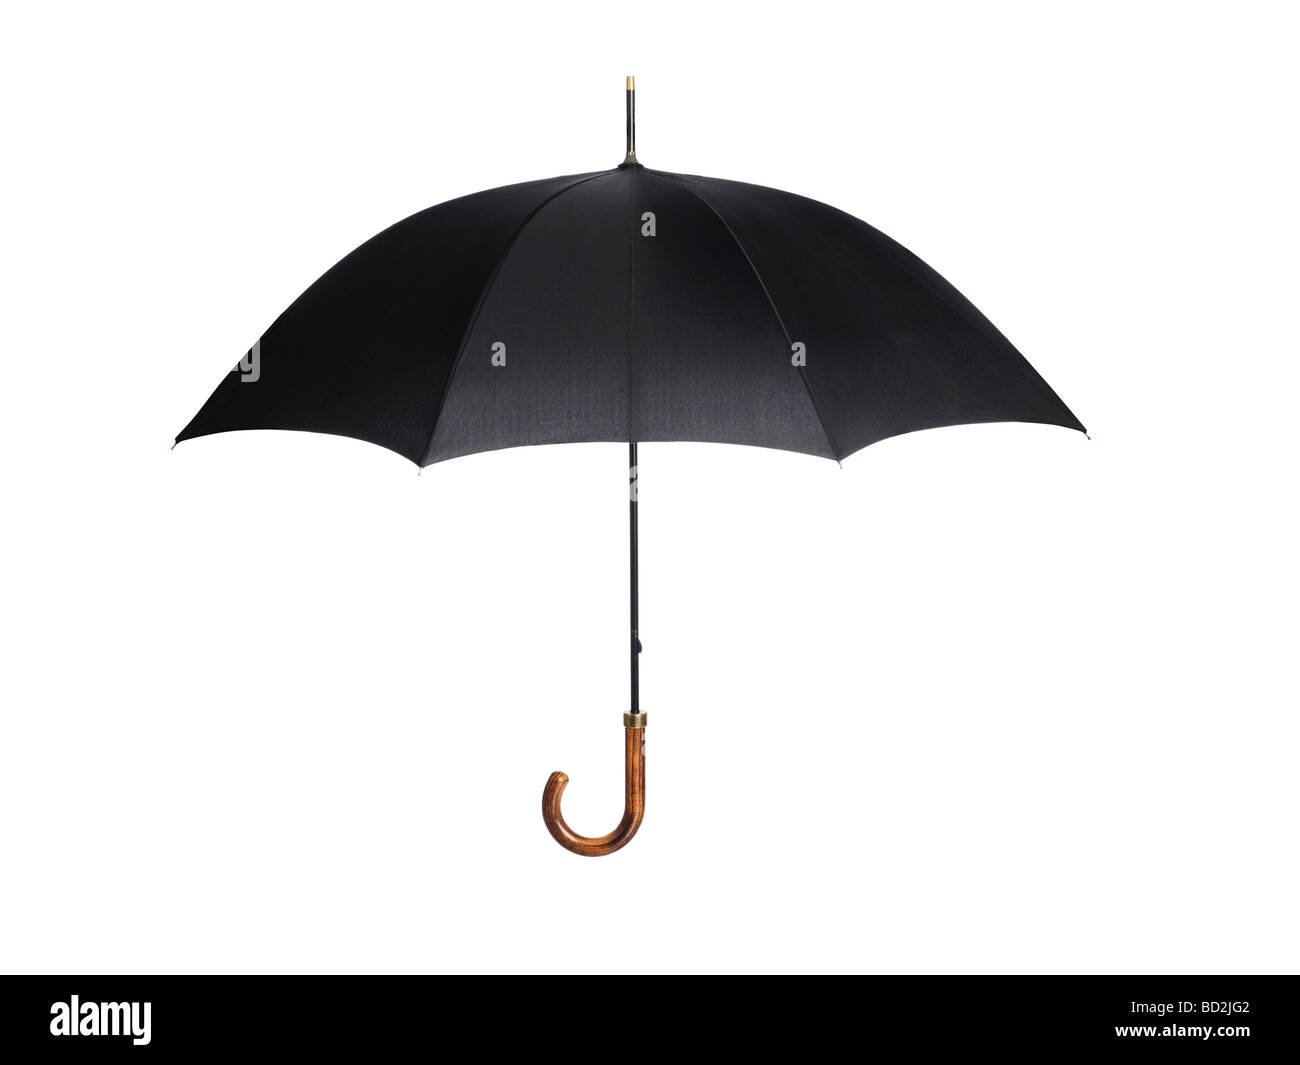 Black open Umbrella - Stock Image